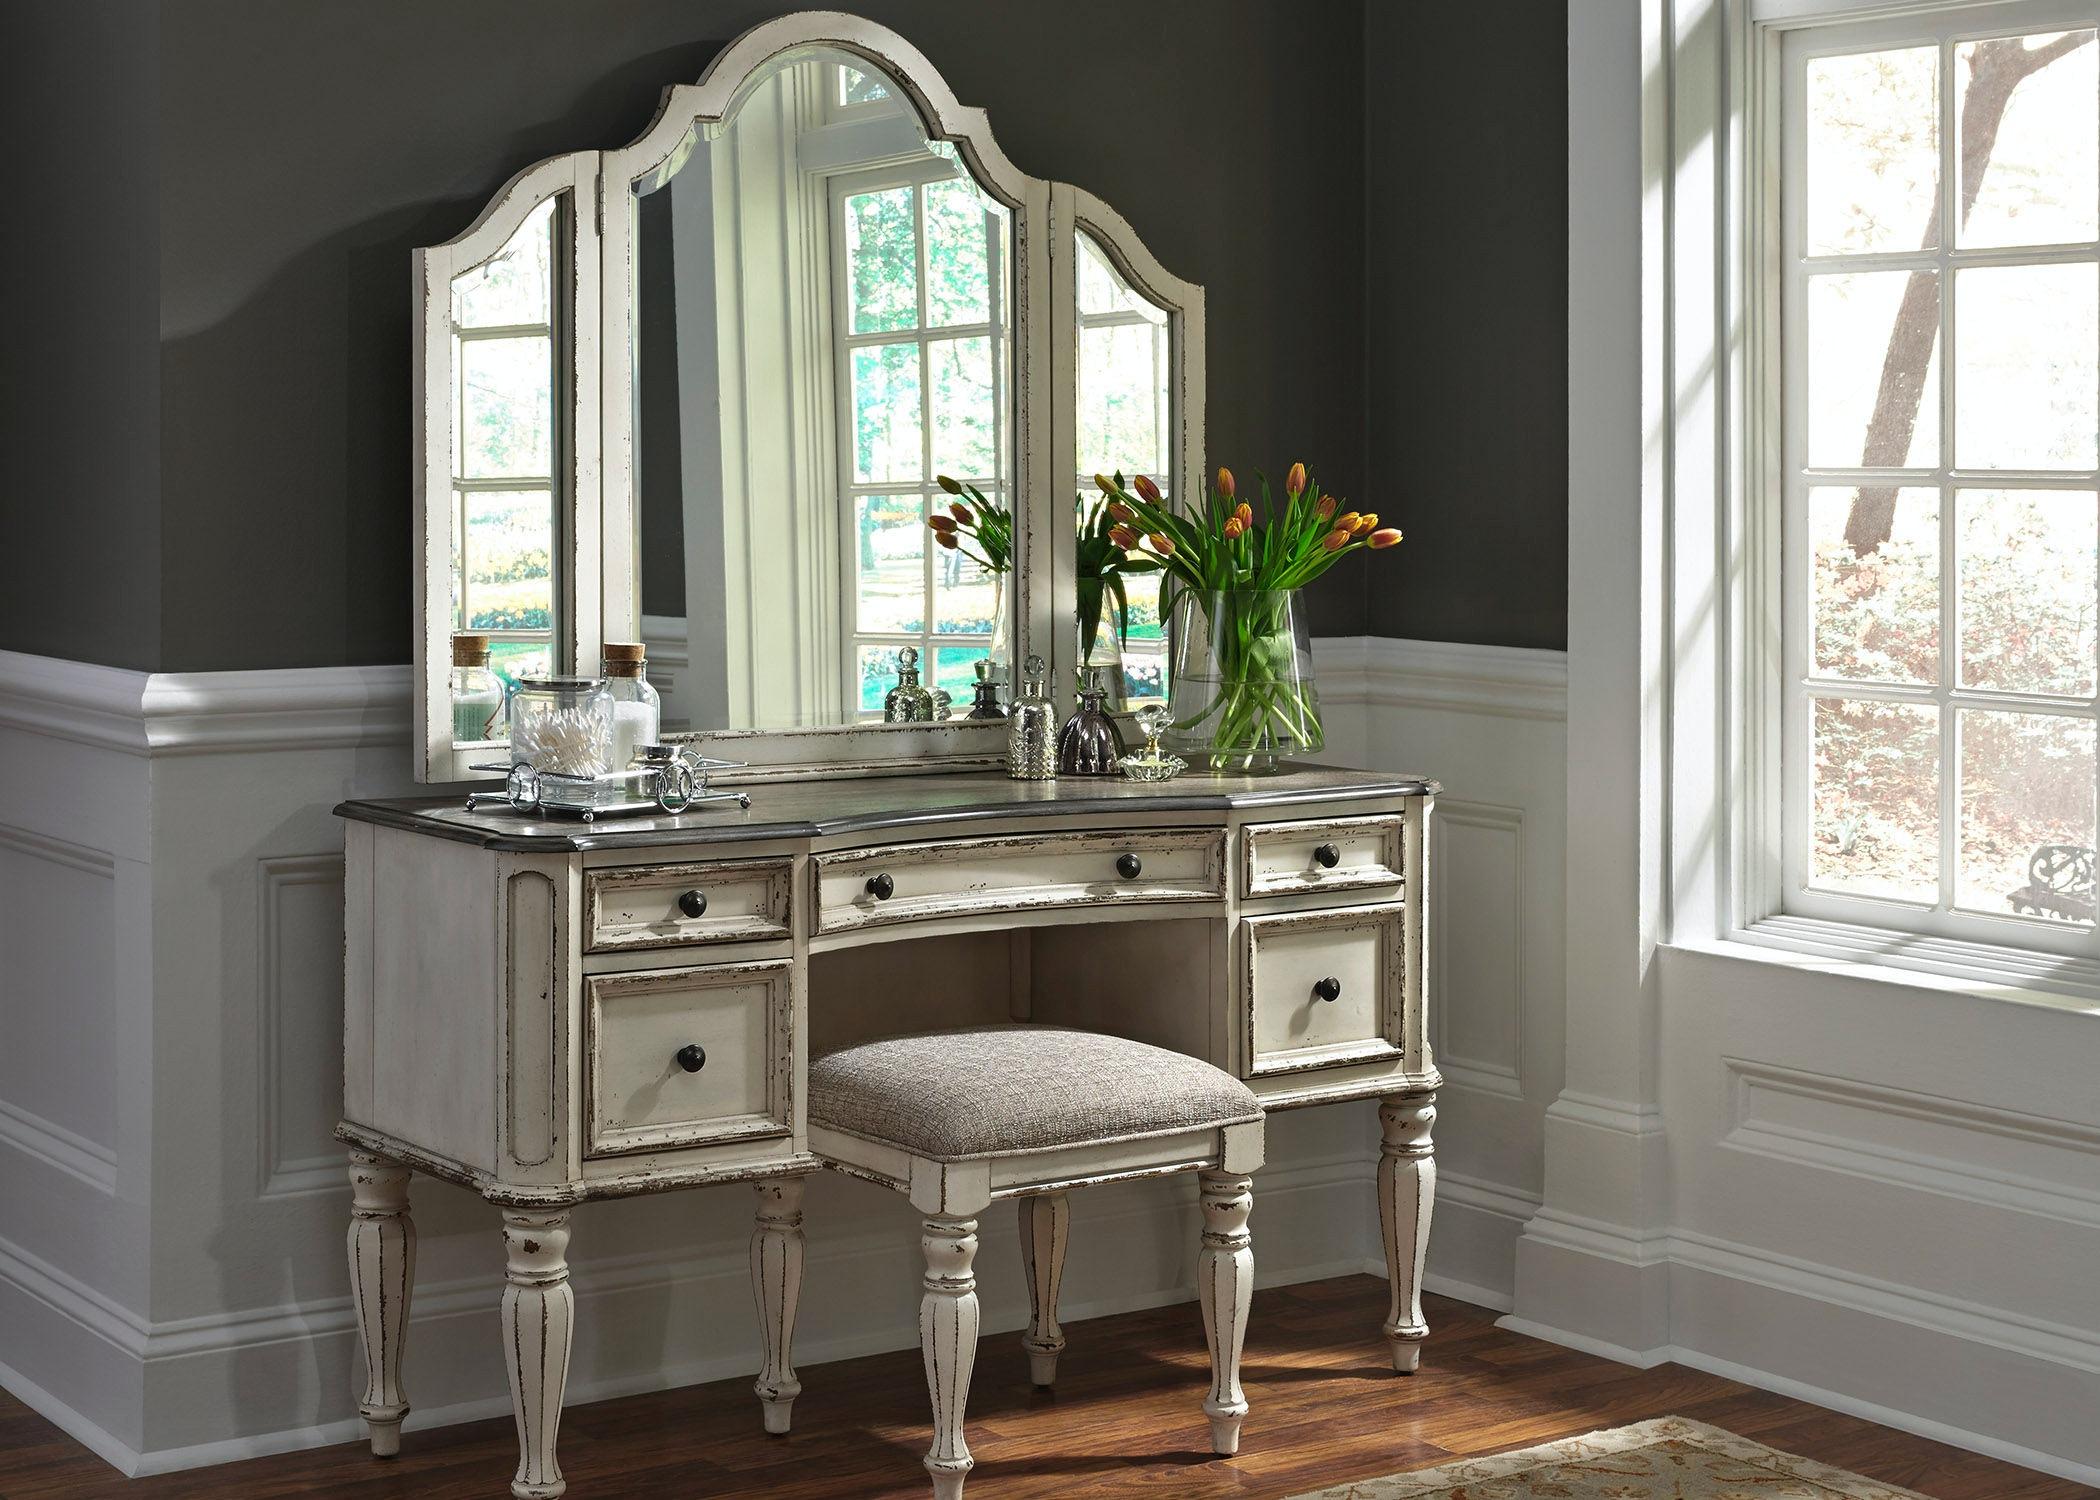 Liberty Furniture Bedroom Vanity 244 Br Vn Arthur F